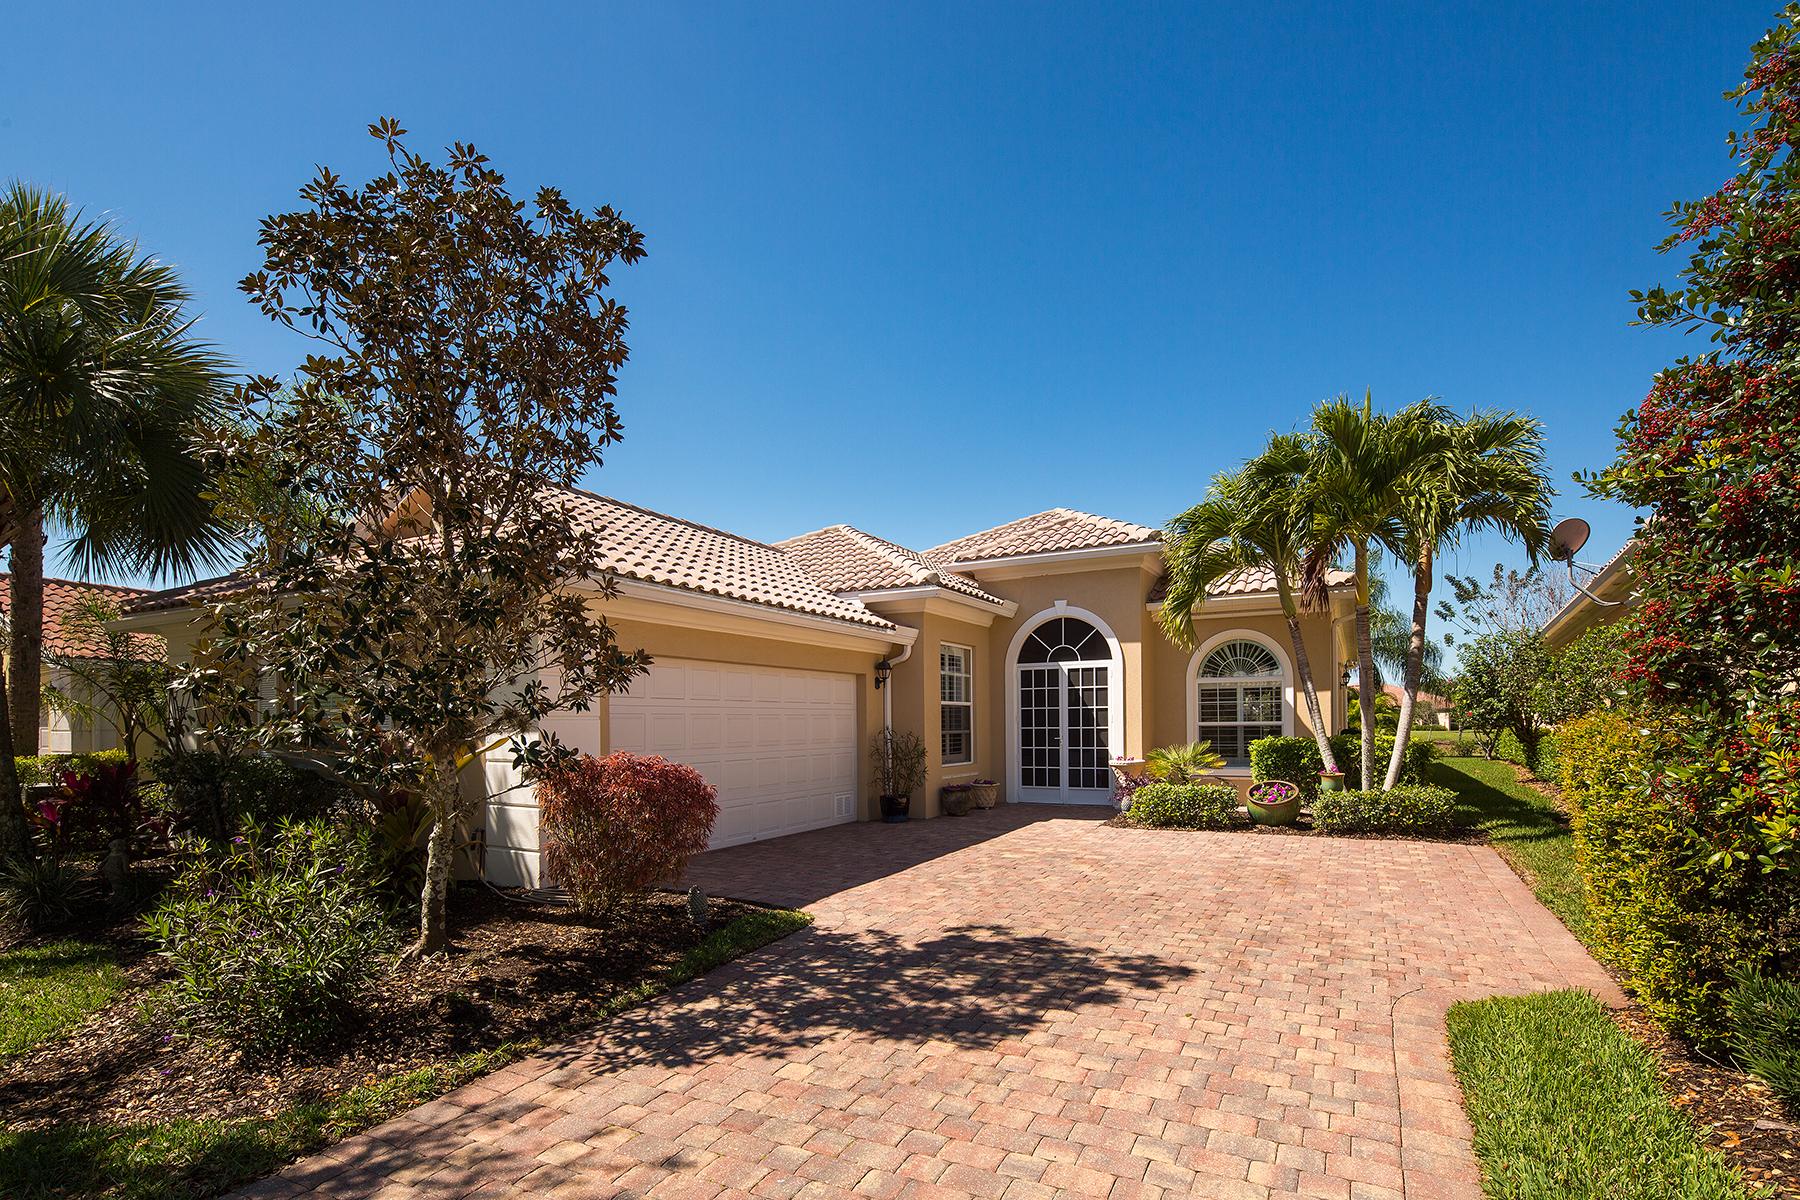 open-houses property at 28628 Wahoo Dr , Bonita Springs, FL 34135